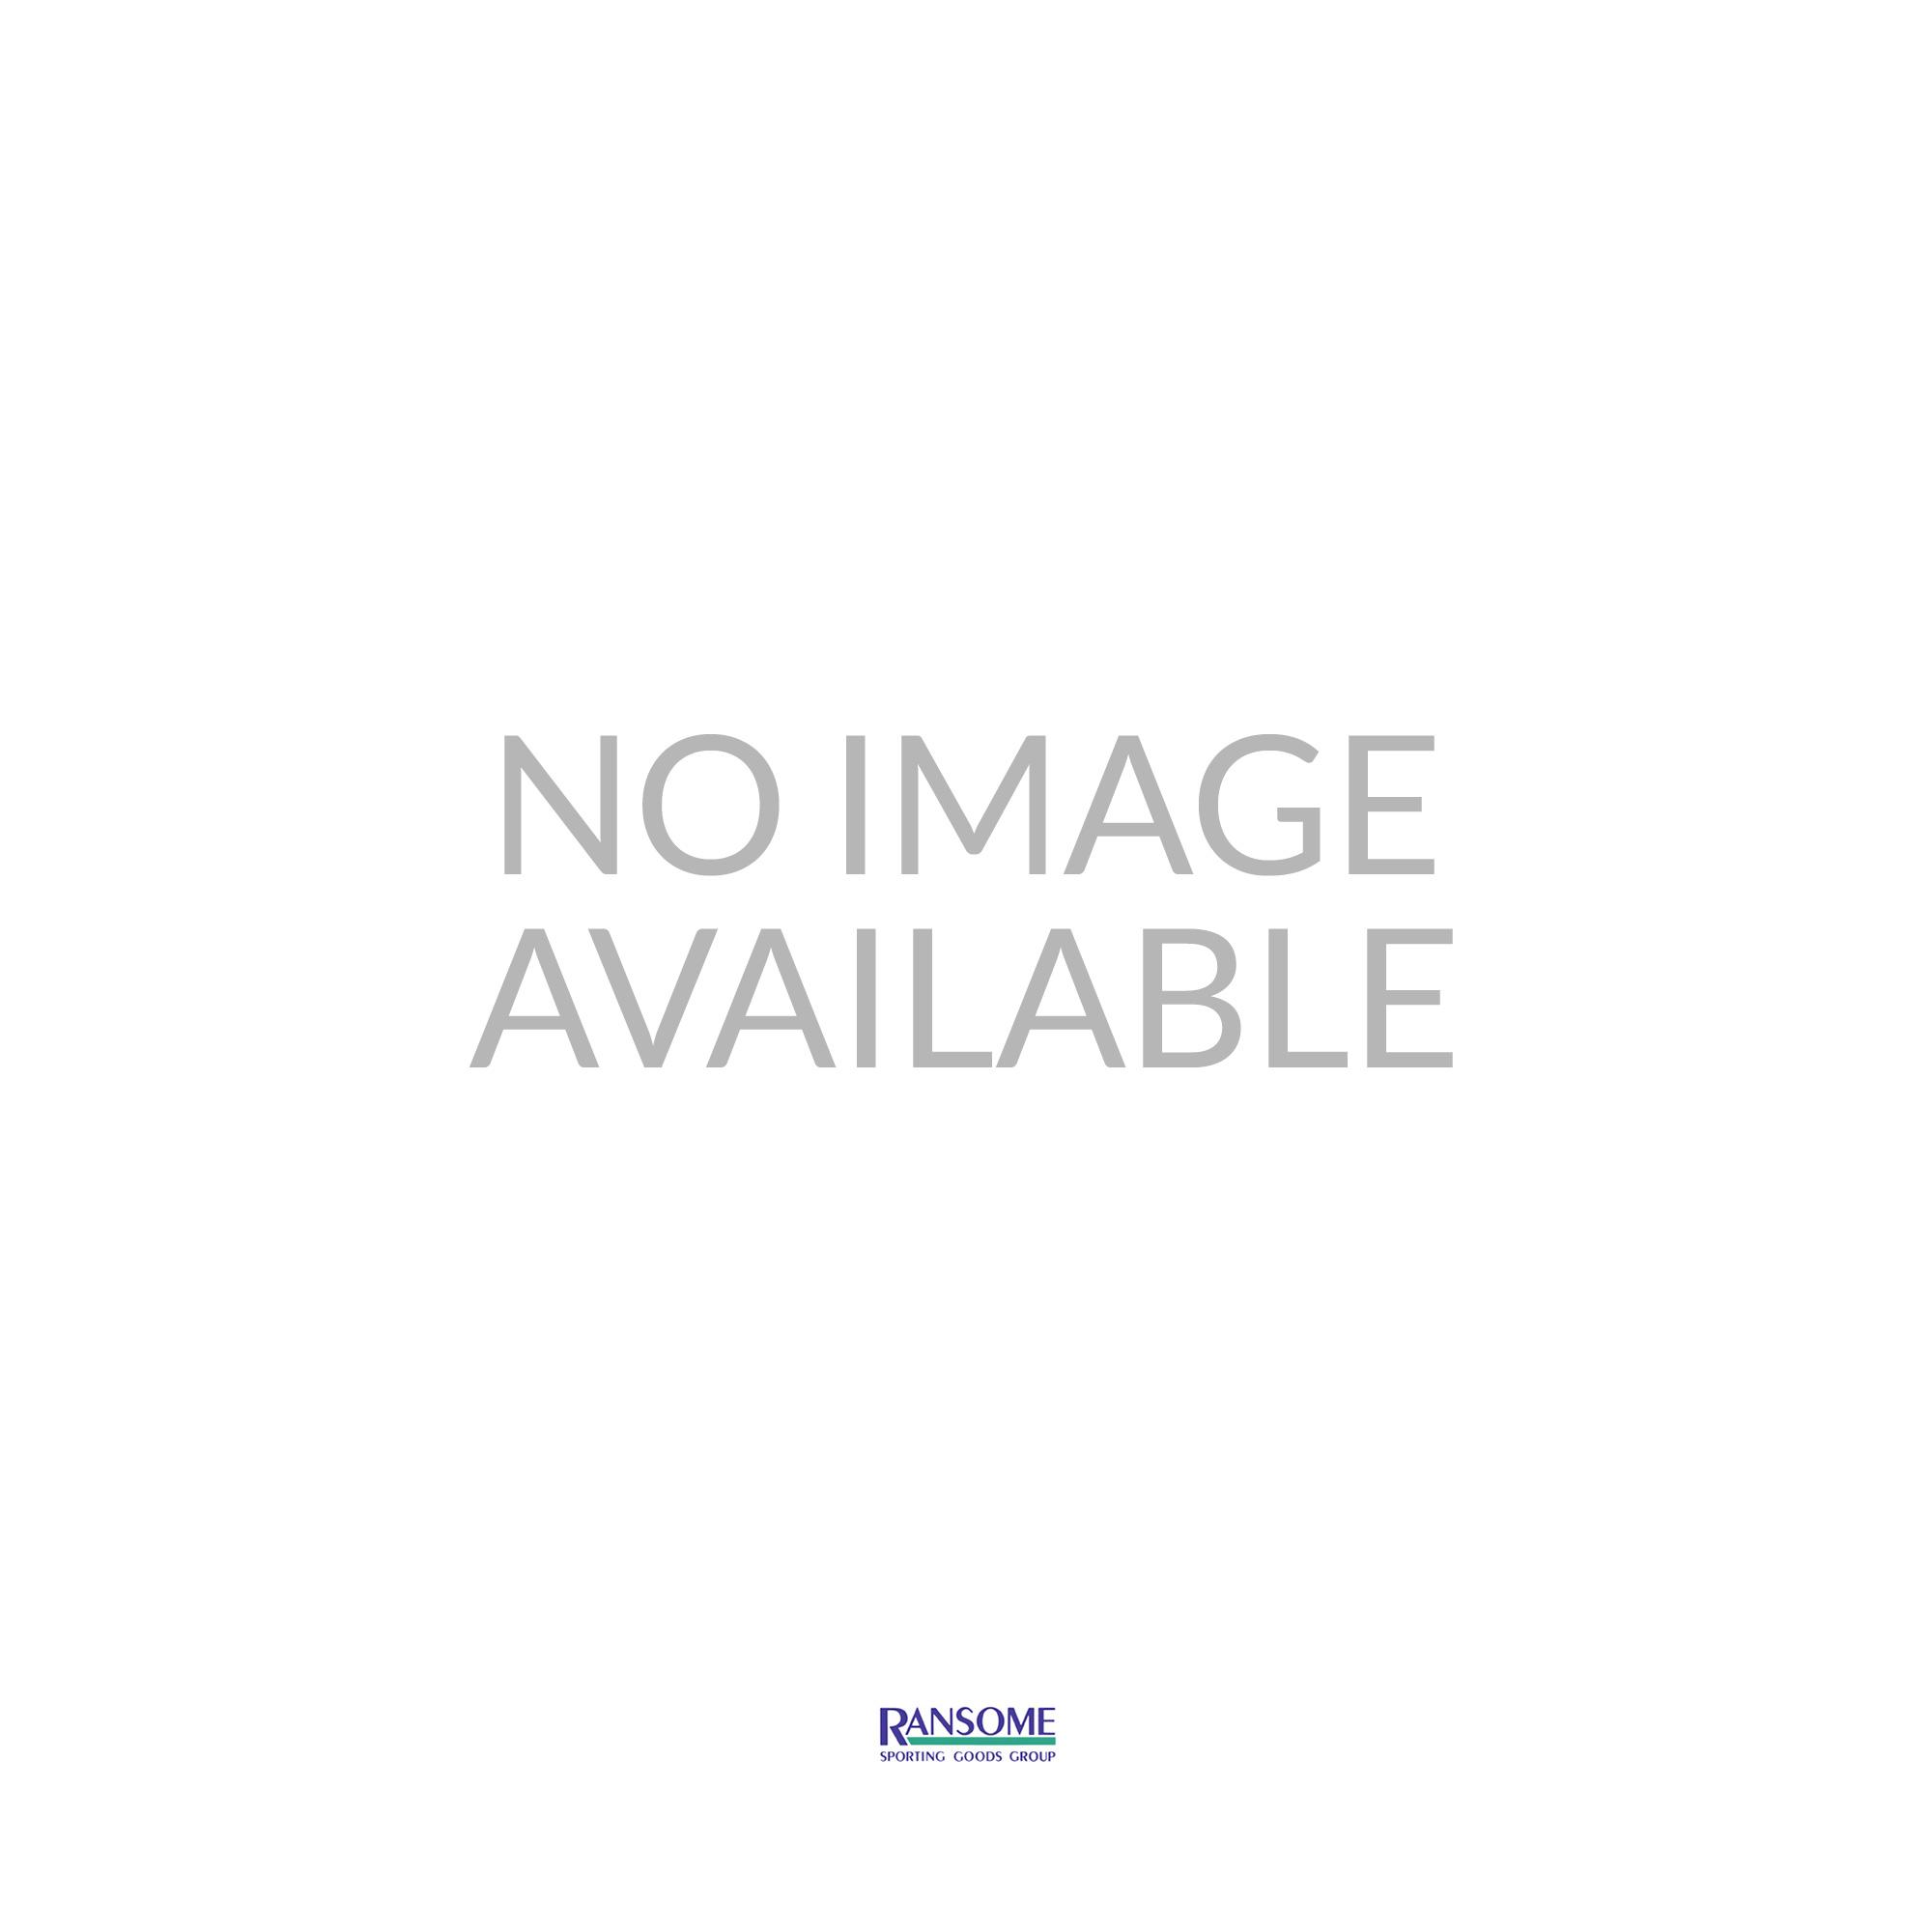 BISI Classic 27 Badminton Racket